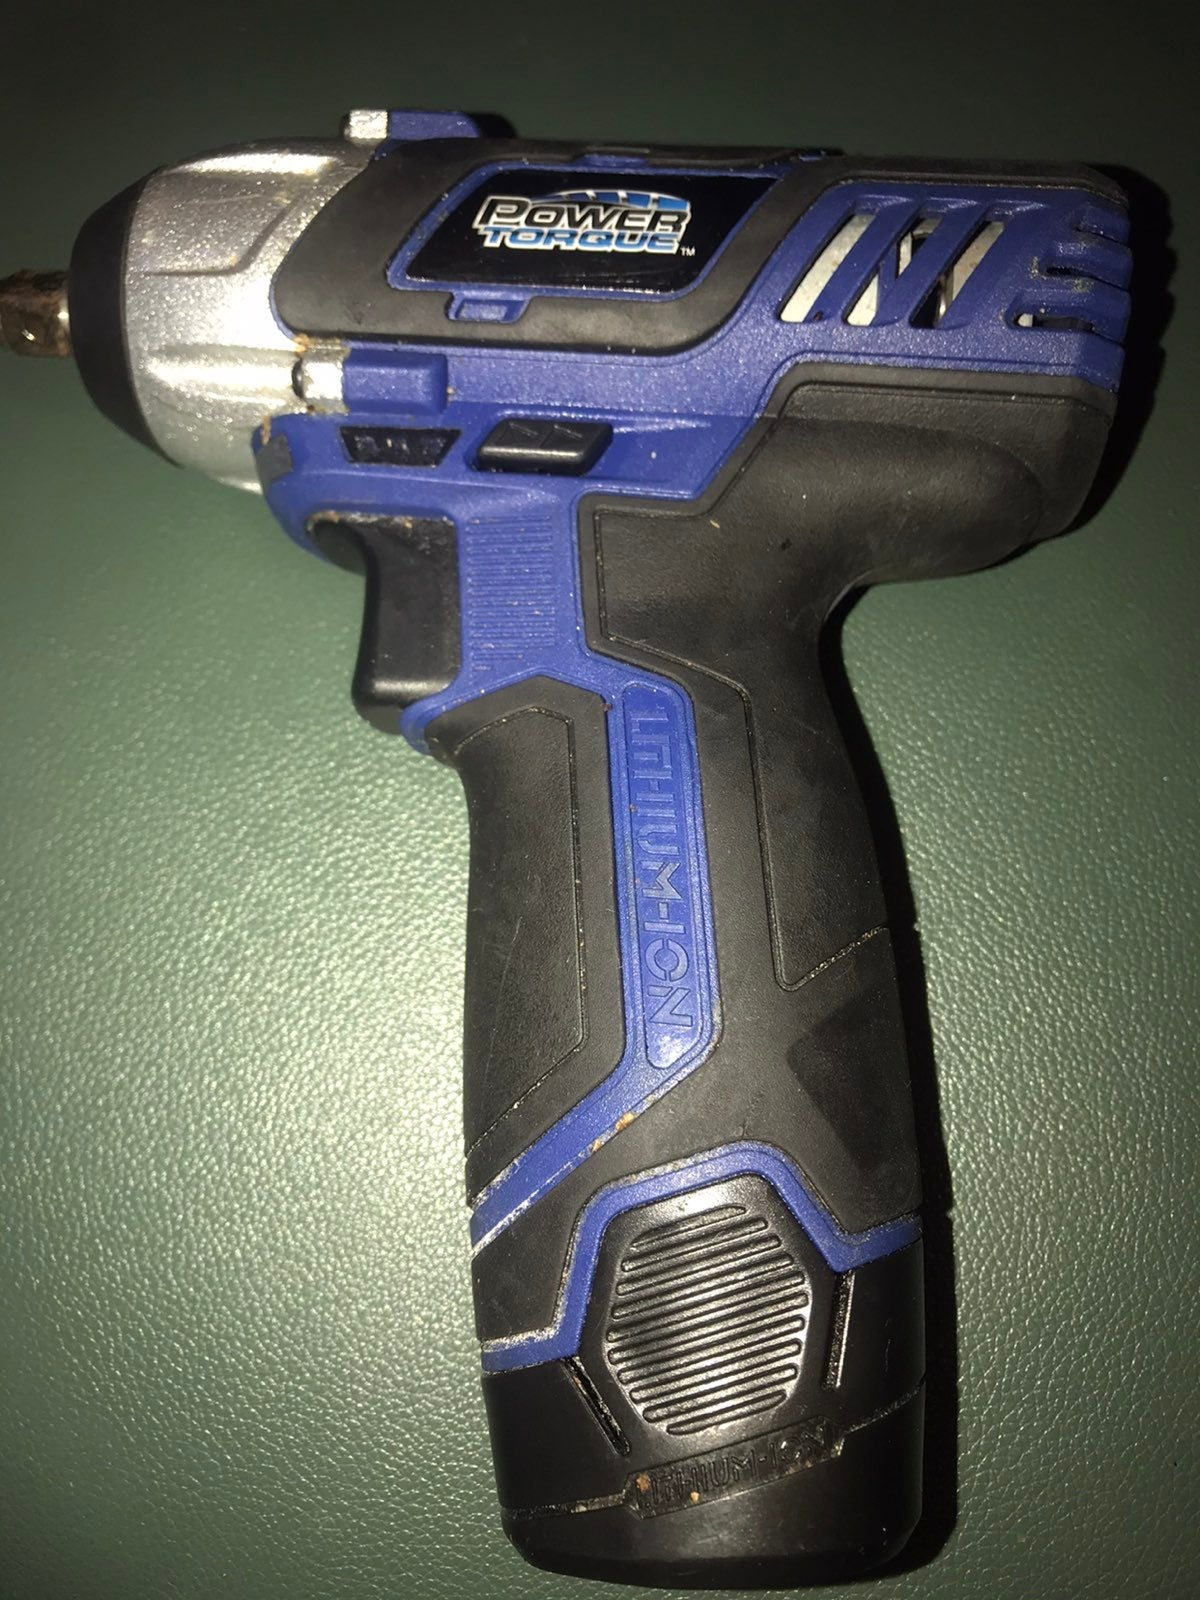 Power Torque 3/8 impact driver